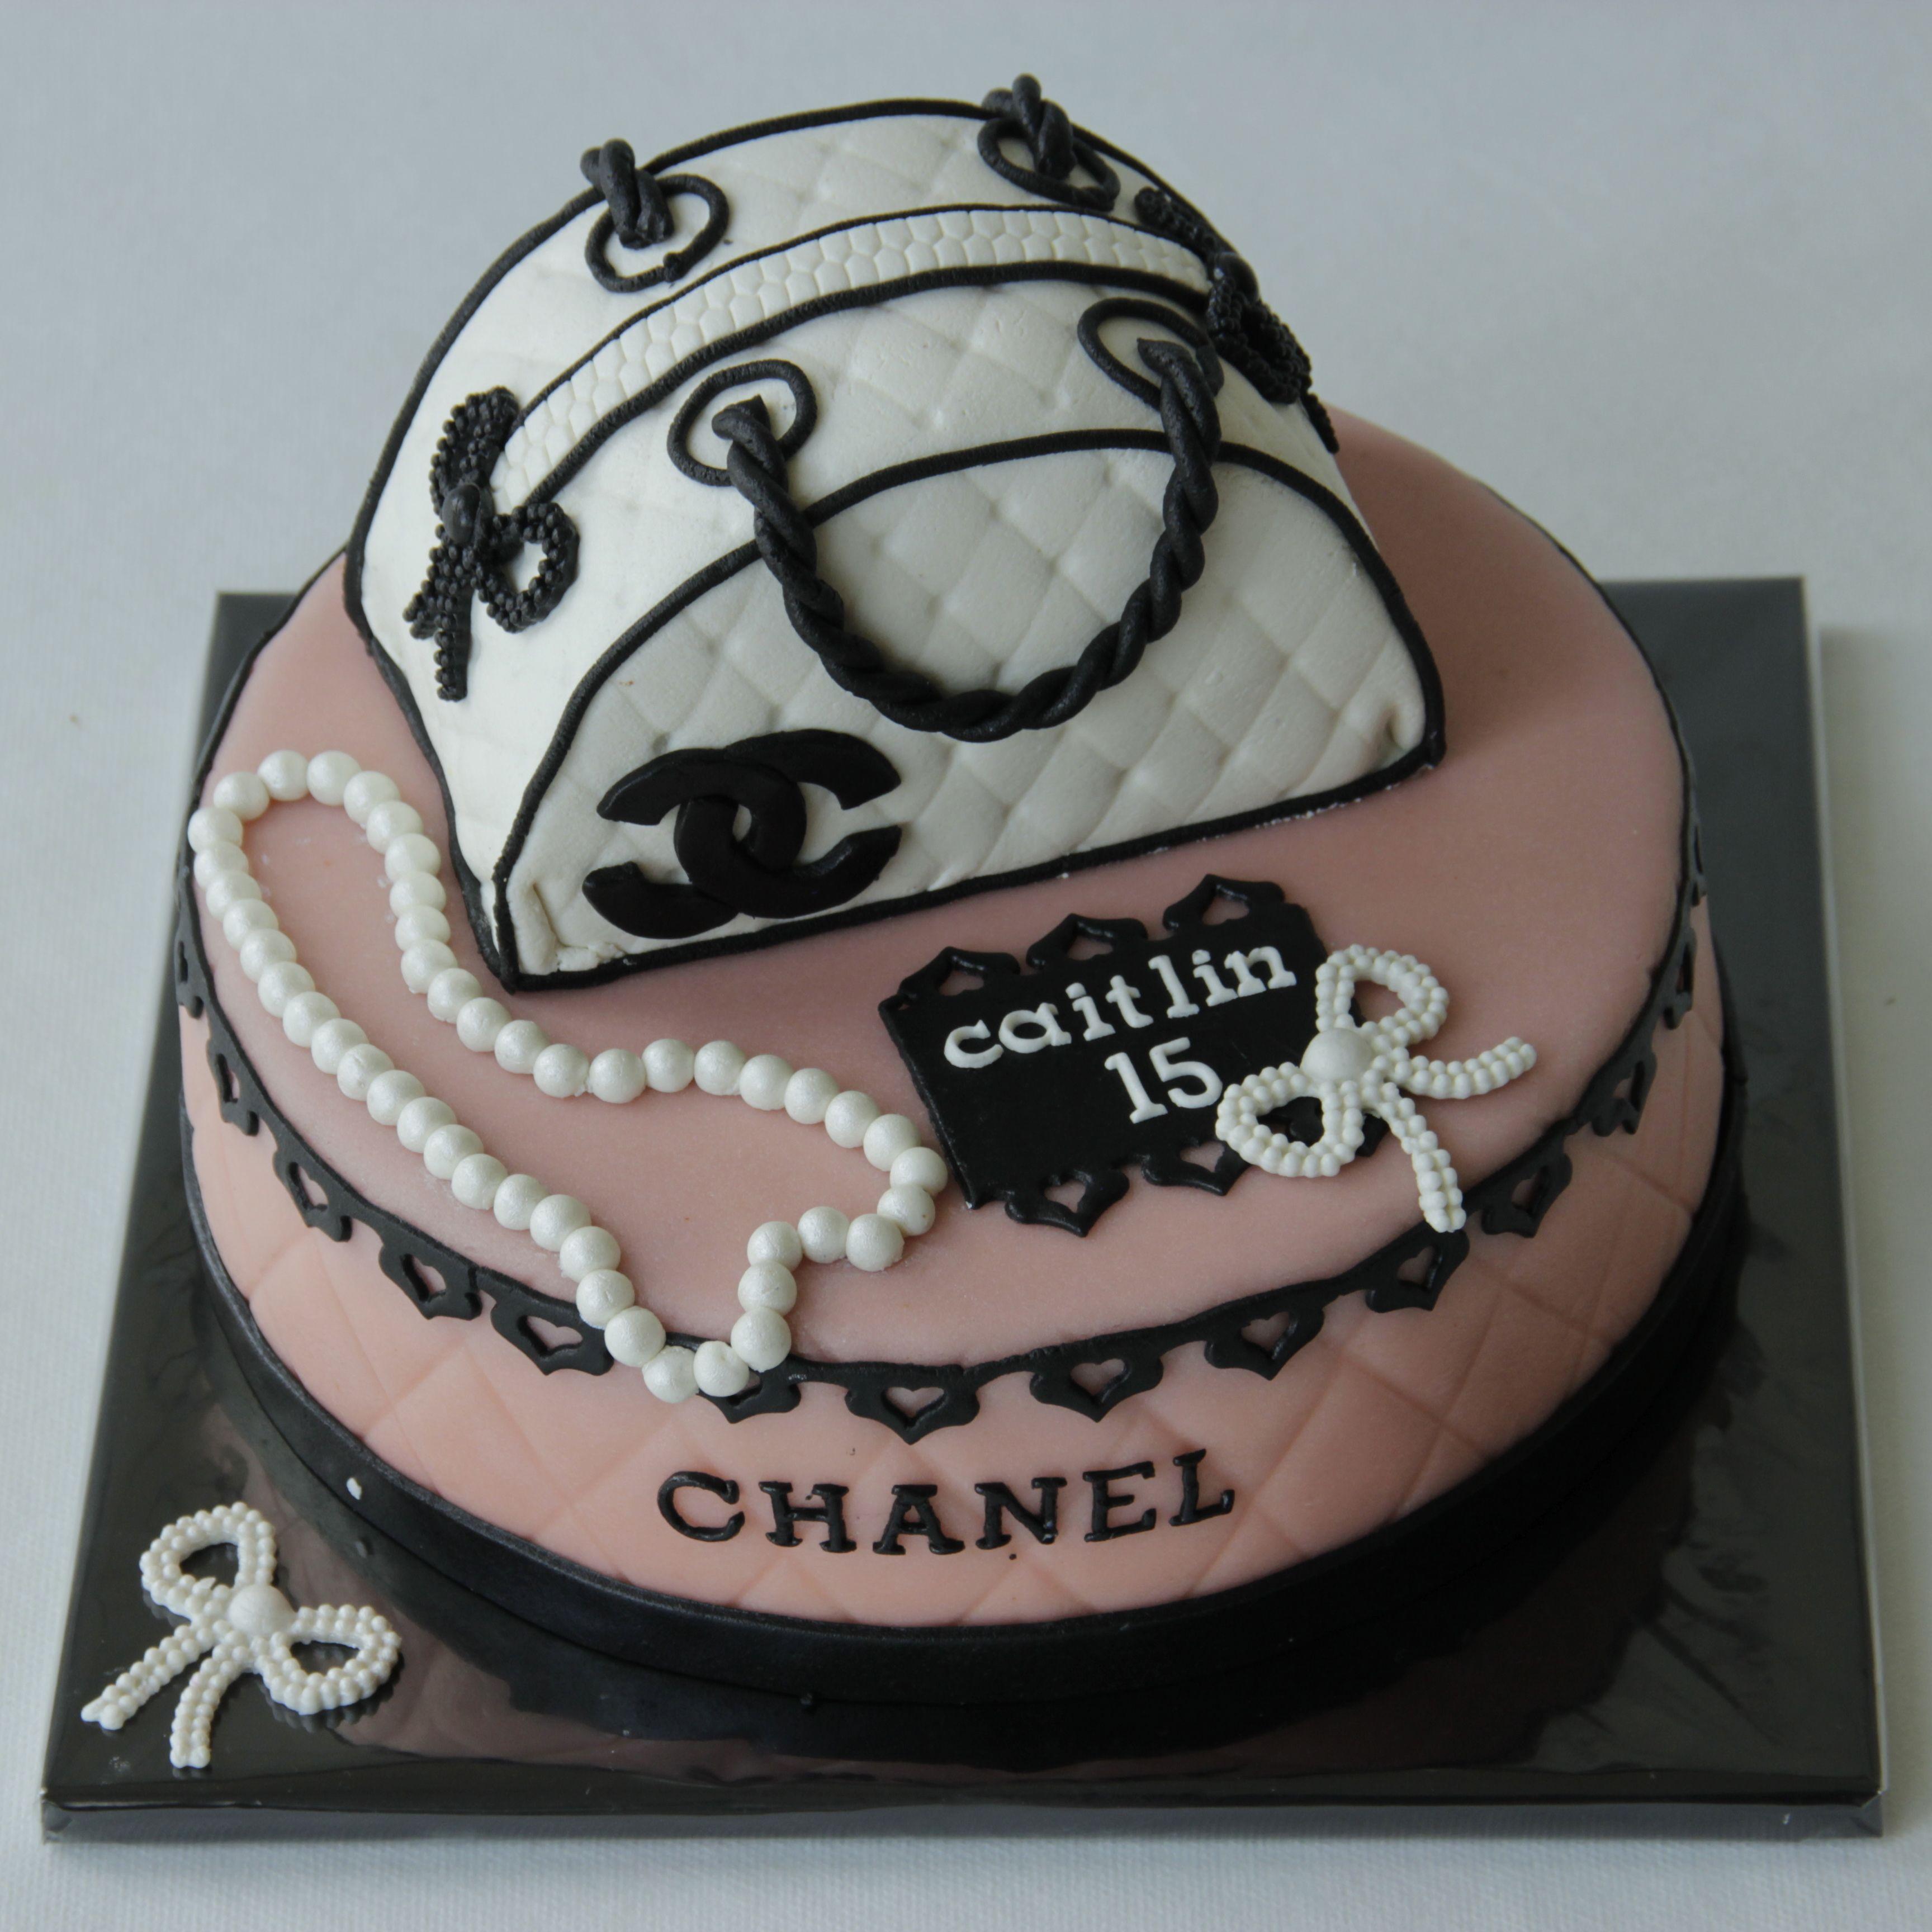 Birthday Cake 4 My 15 Year Old Niece Cake Birthday Cake Cake Pops